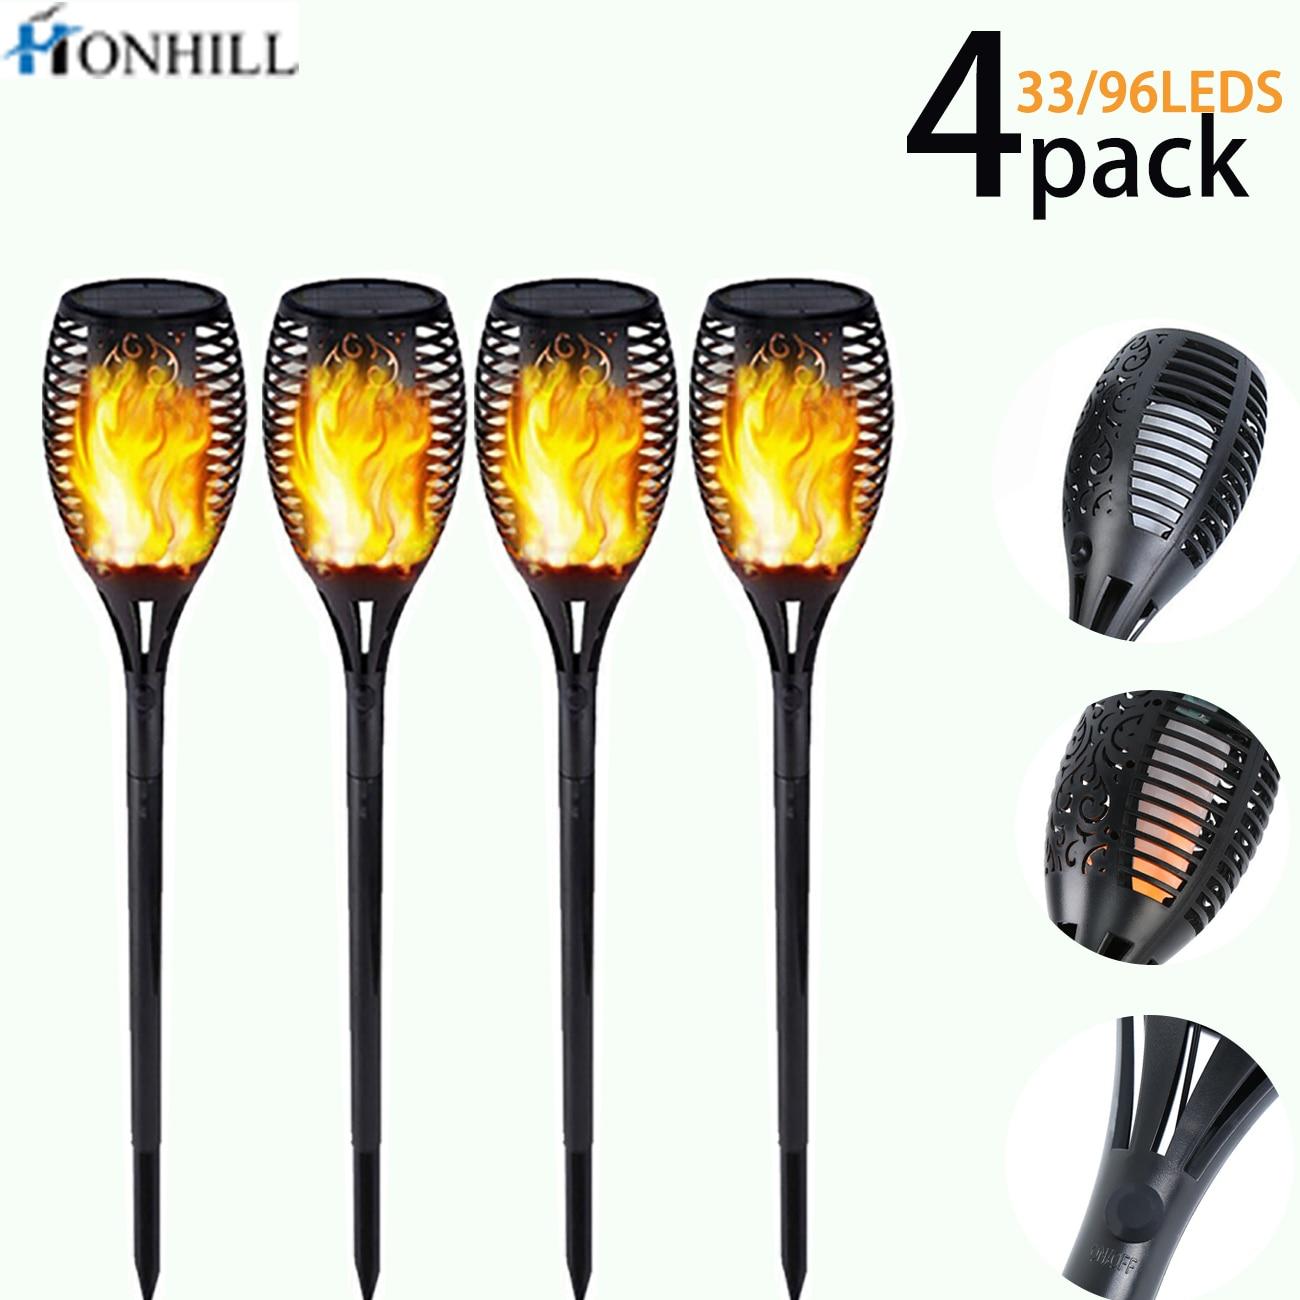 Honhill 33/96 LED Solar Flame Lamp Flickering Outdoor IP65 Waterproof Landscape Yard Garden Light Path Lighting Torch Light 4pcs